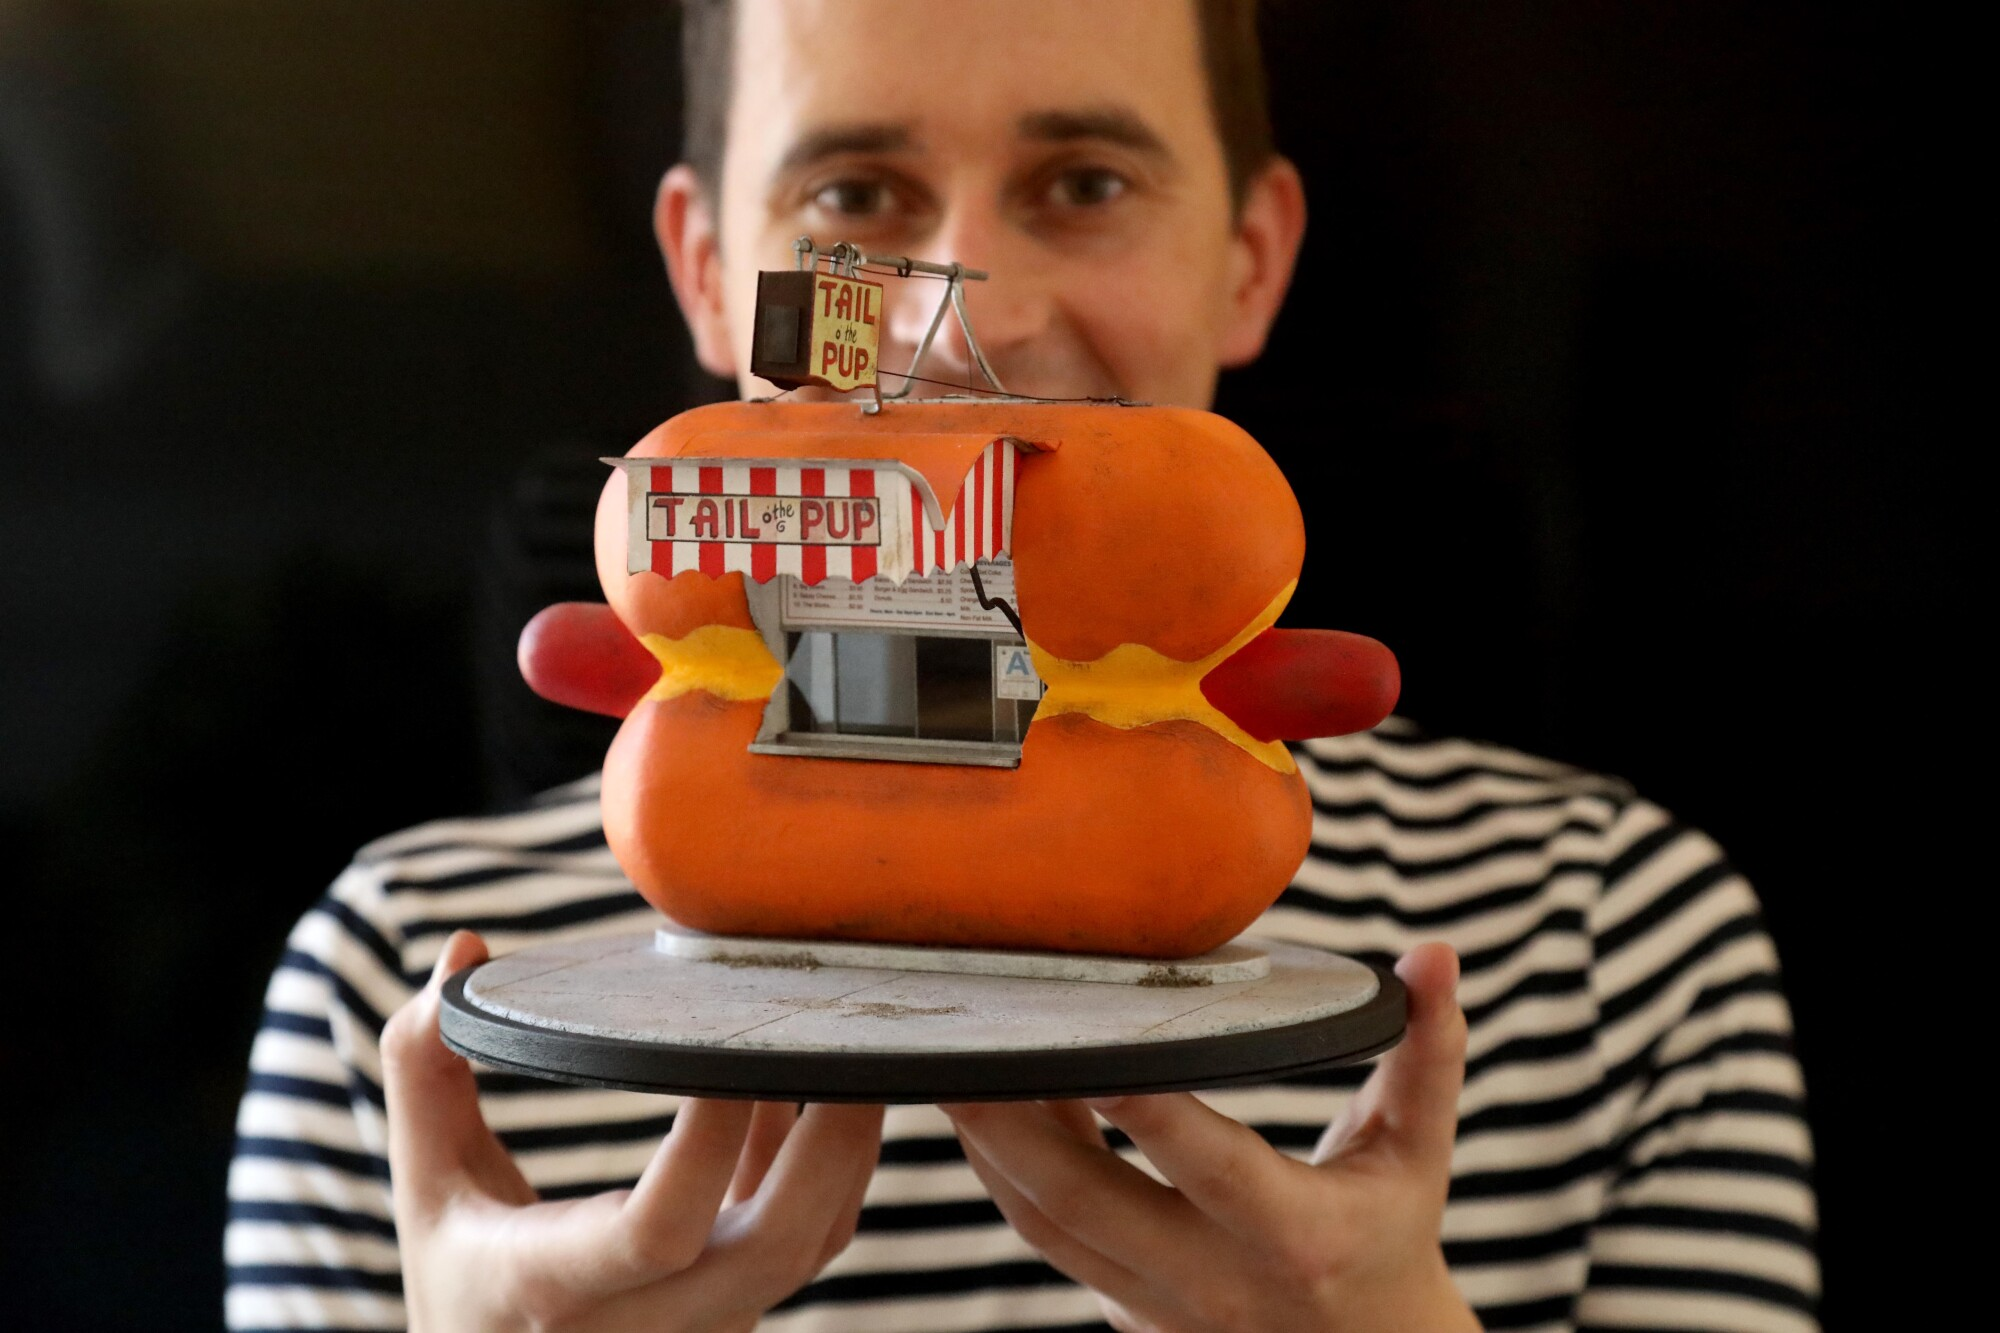 Kieran Wright holds his miniature model of a hotdog-shaped hotdog stand